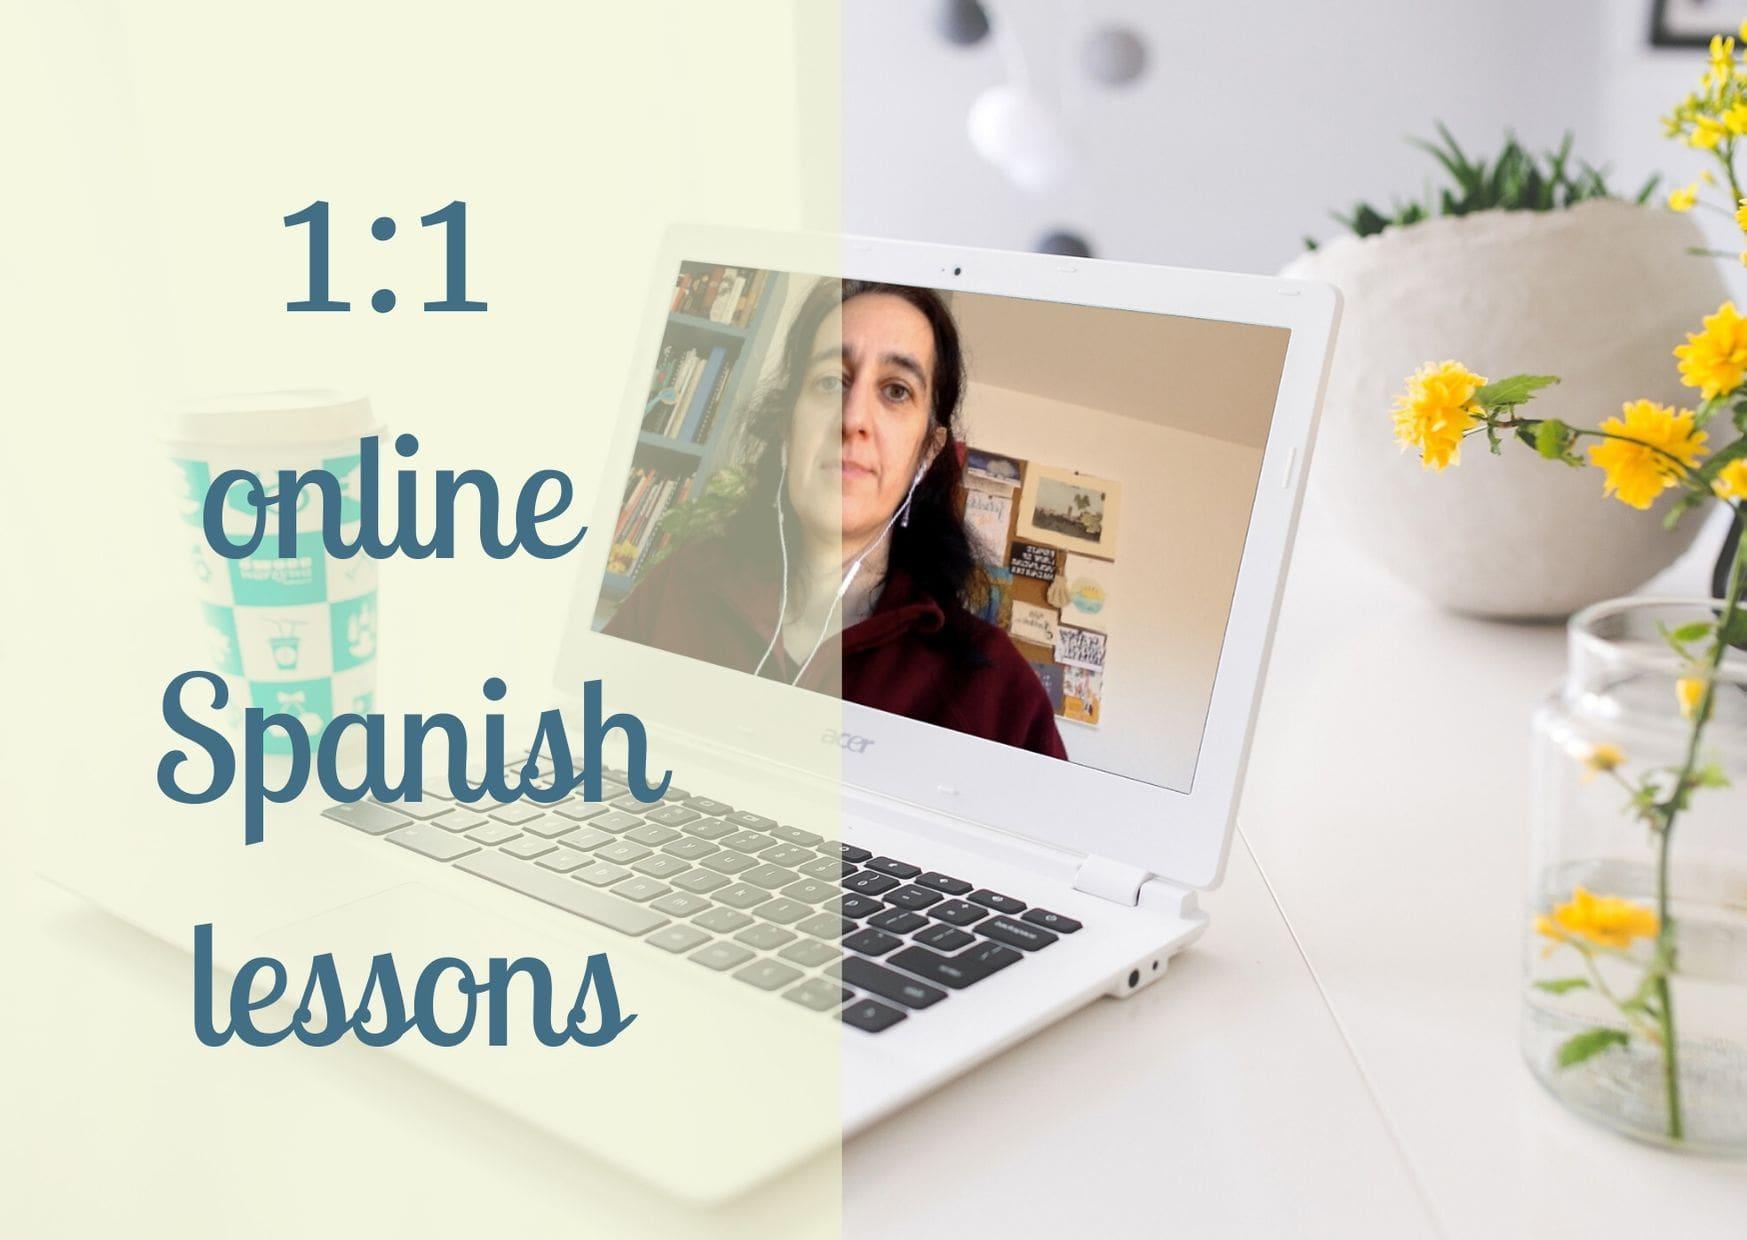 Do you need Spanish